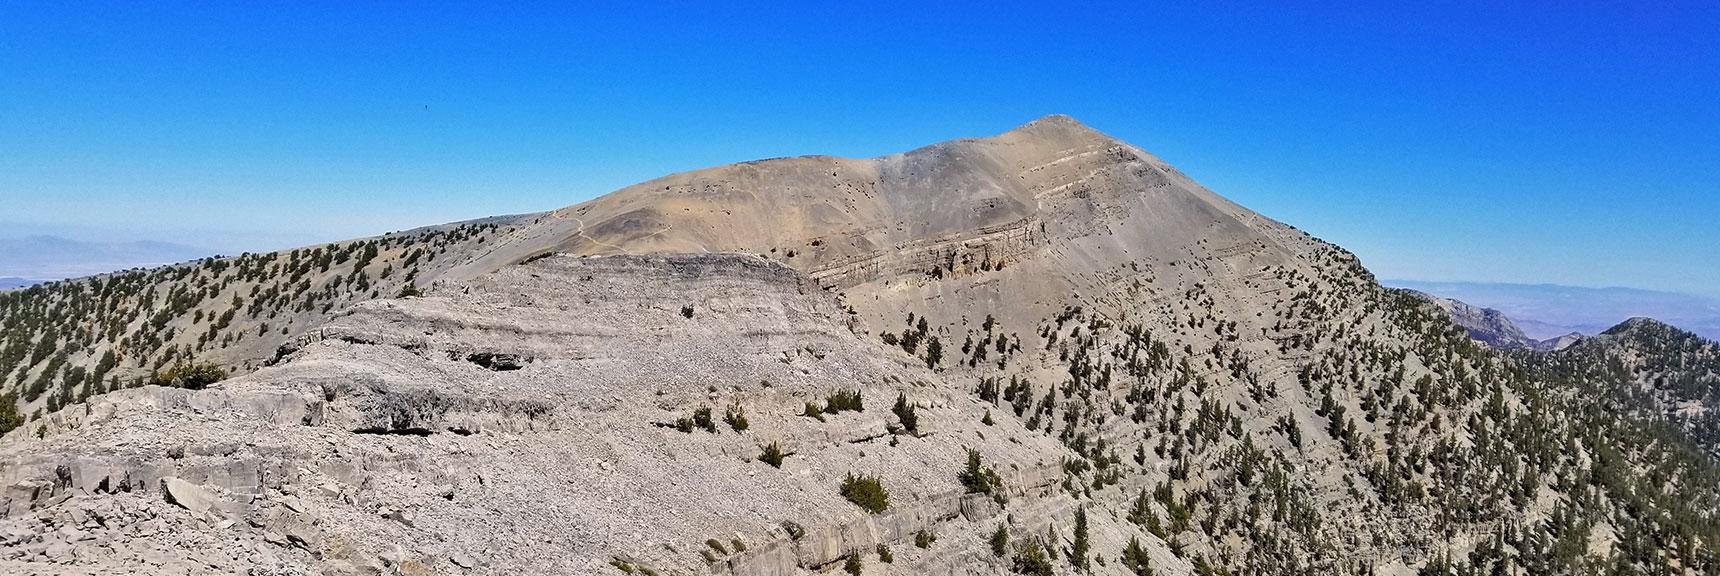 Charleston Peak from Kyle Canyon Upper South Ridge | Griffith Peak & Charleston Peak Circuit Run, Spring Mountains, Nevada